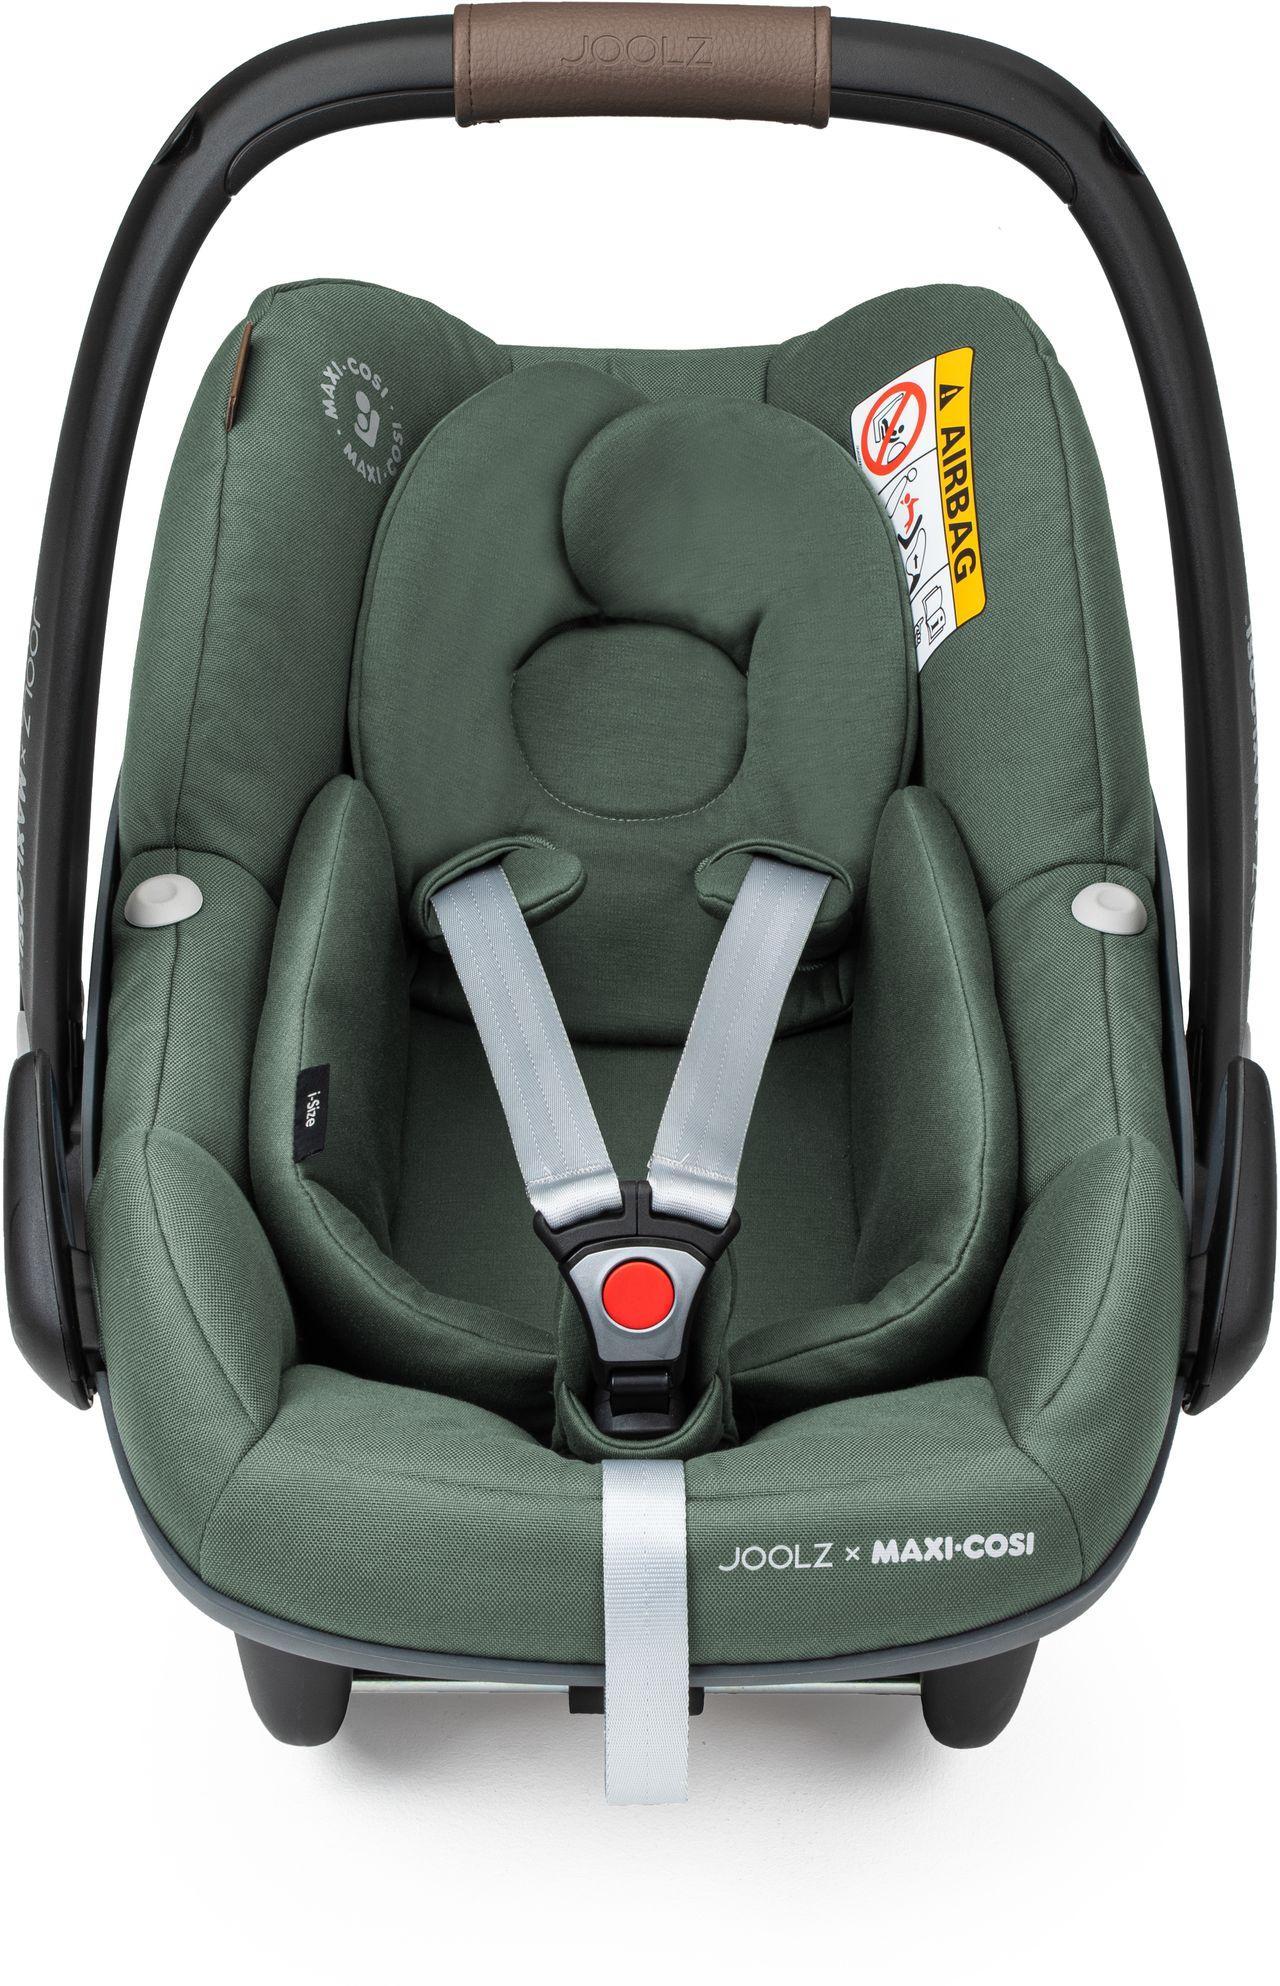 Joolz x Maxi-Cosi Babyschale in Berlin kaufen - Kleine Fabriek